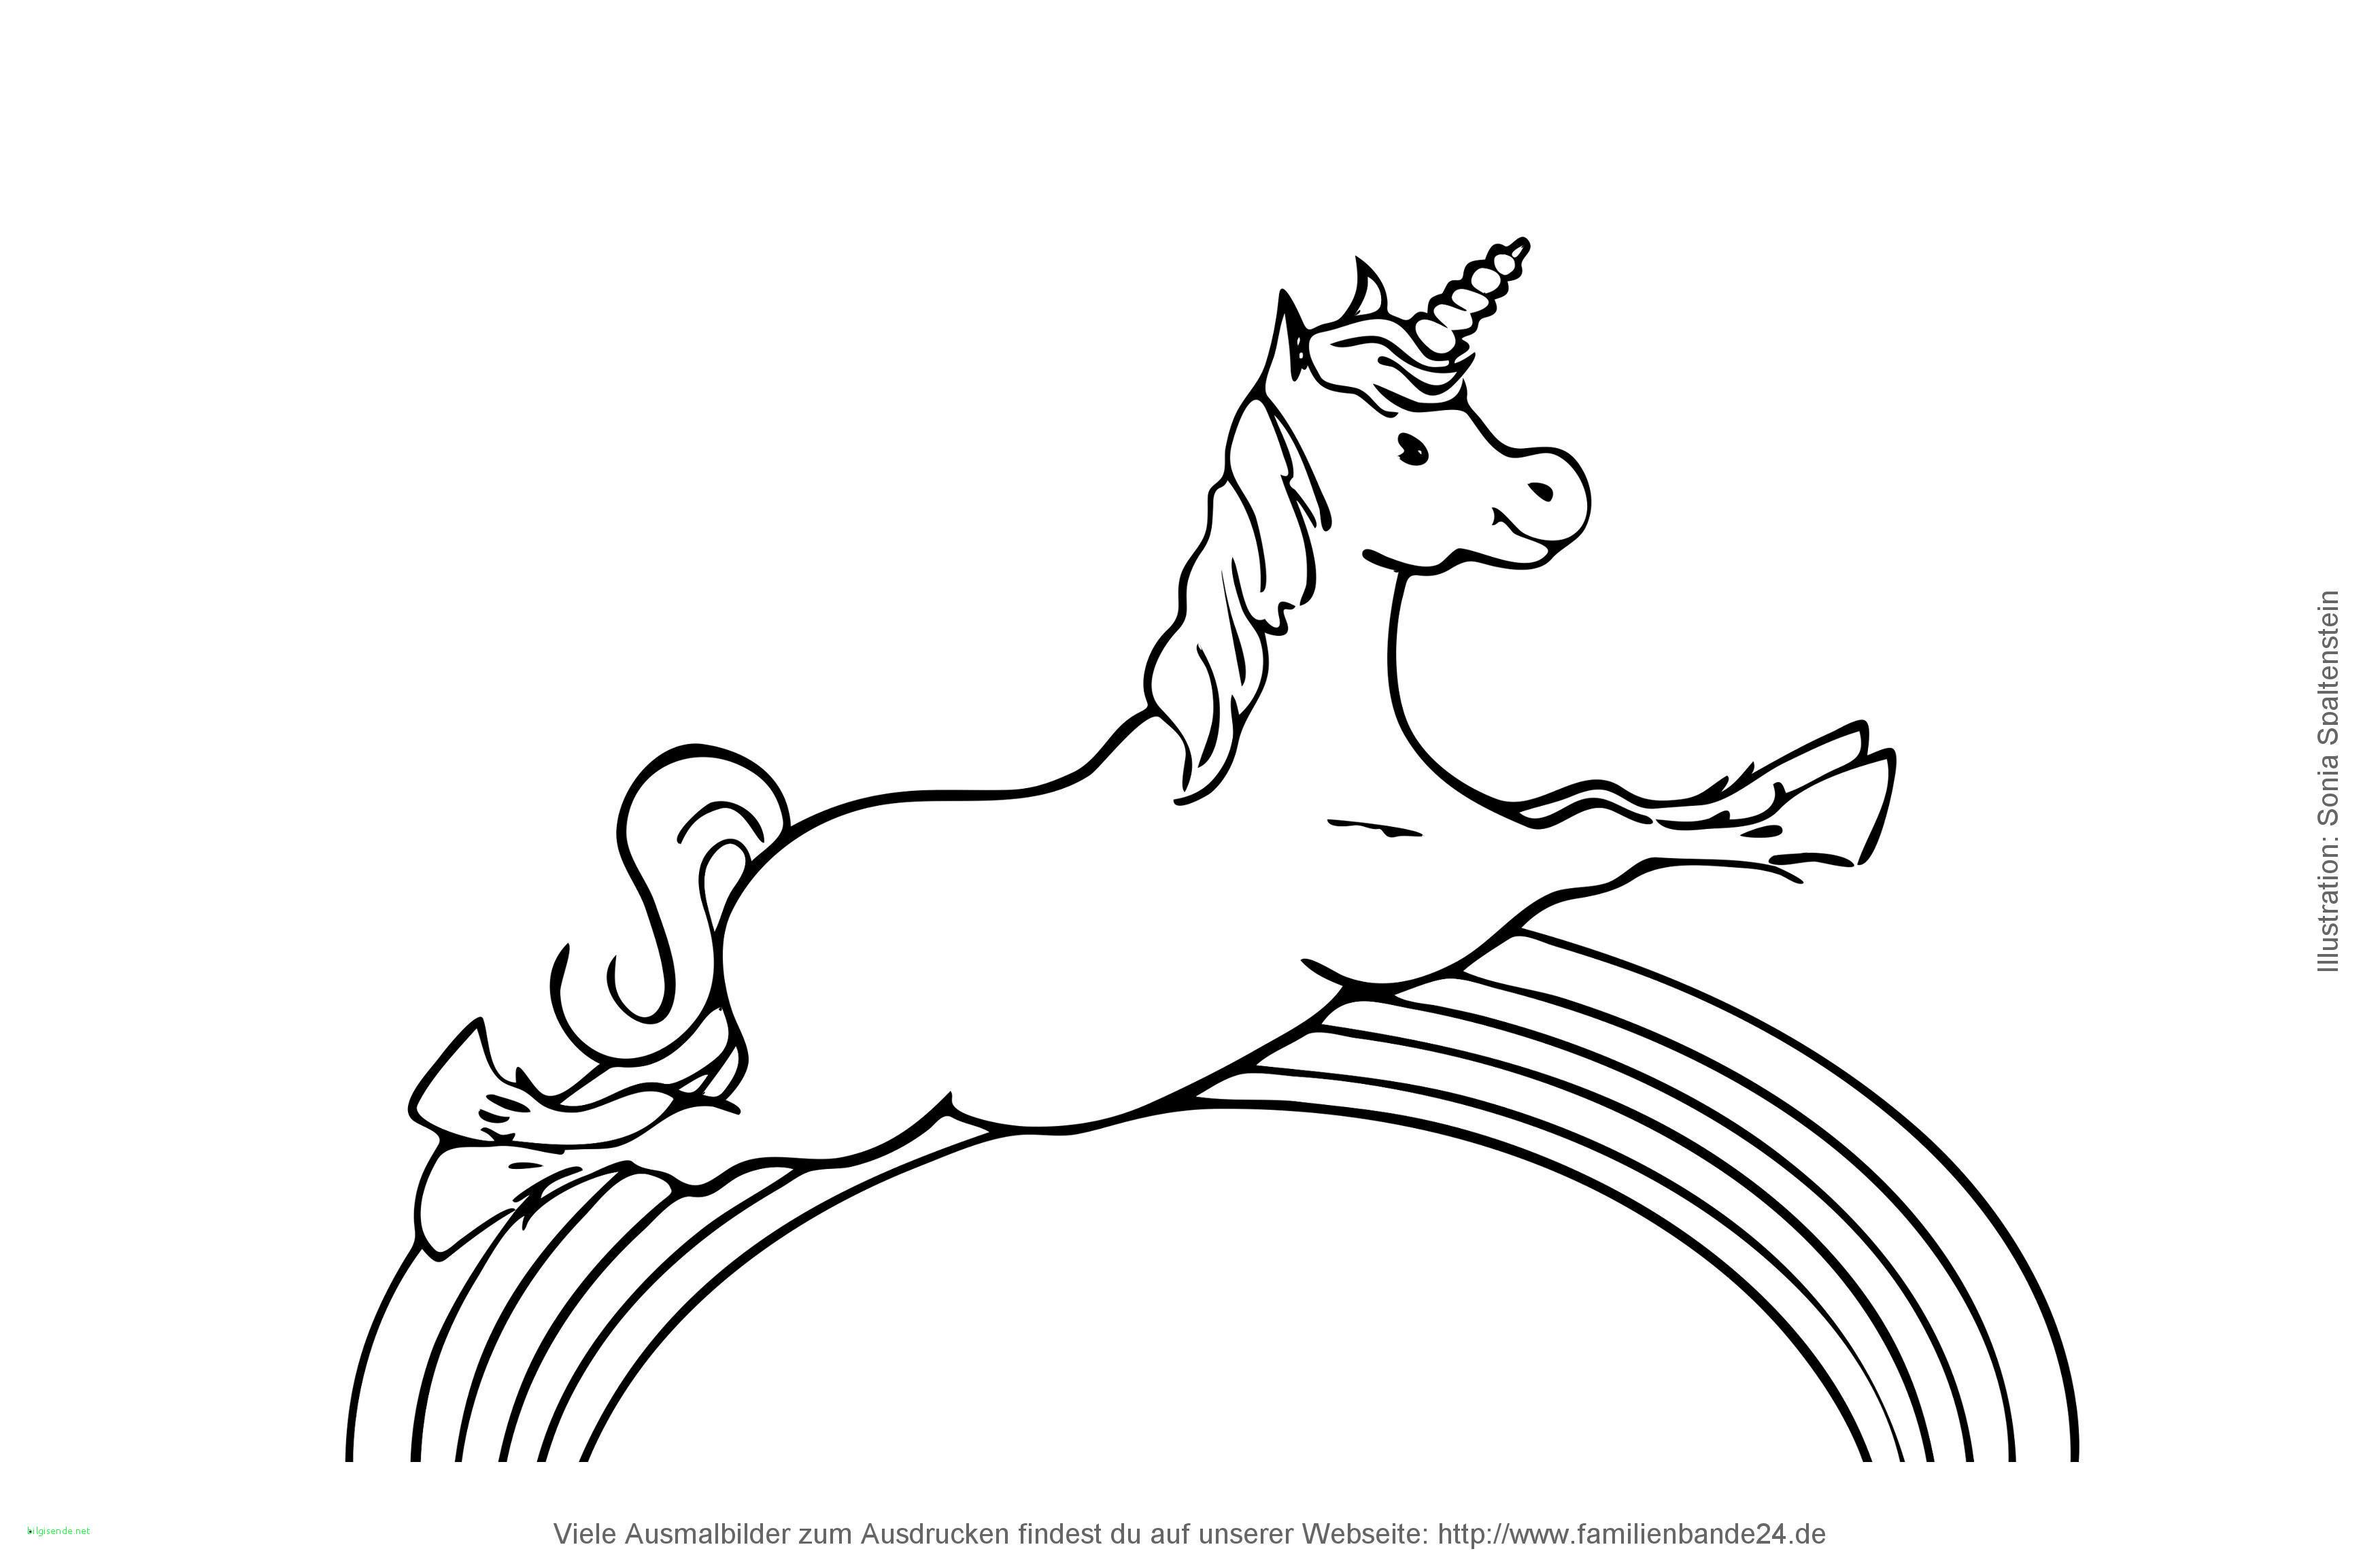 Ausmalbilder Little Pony Genial 52 Architektur Ausmalbilder Hello Kitty Ausdrucken Treehouse Nyc Stock